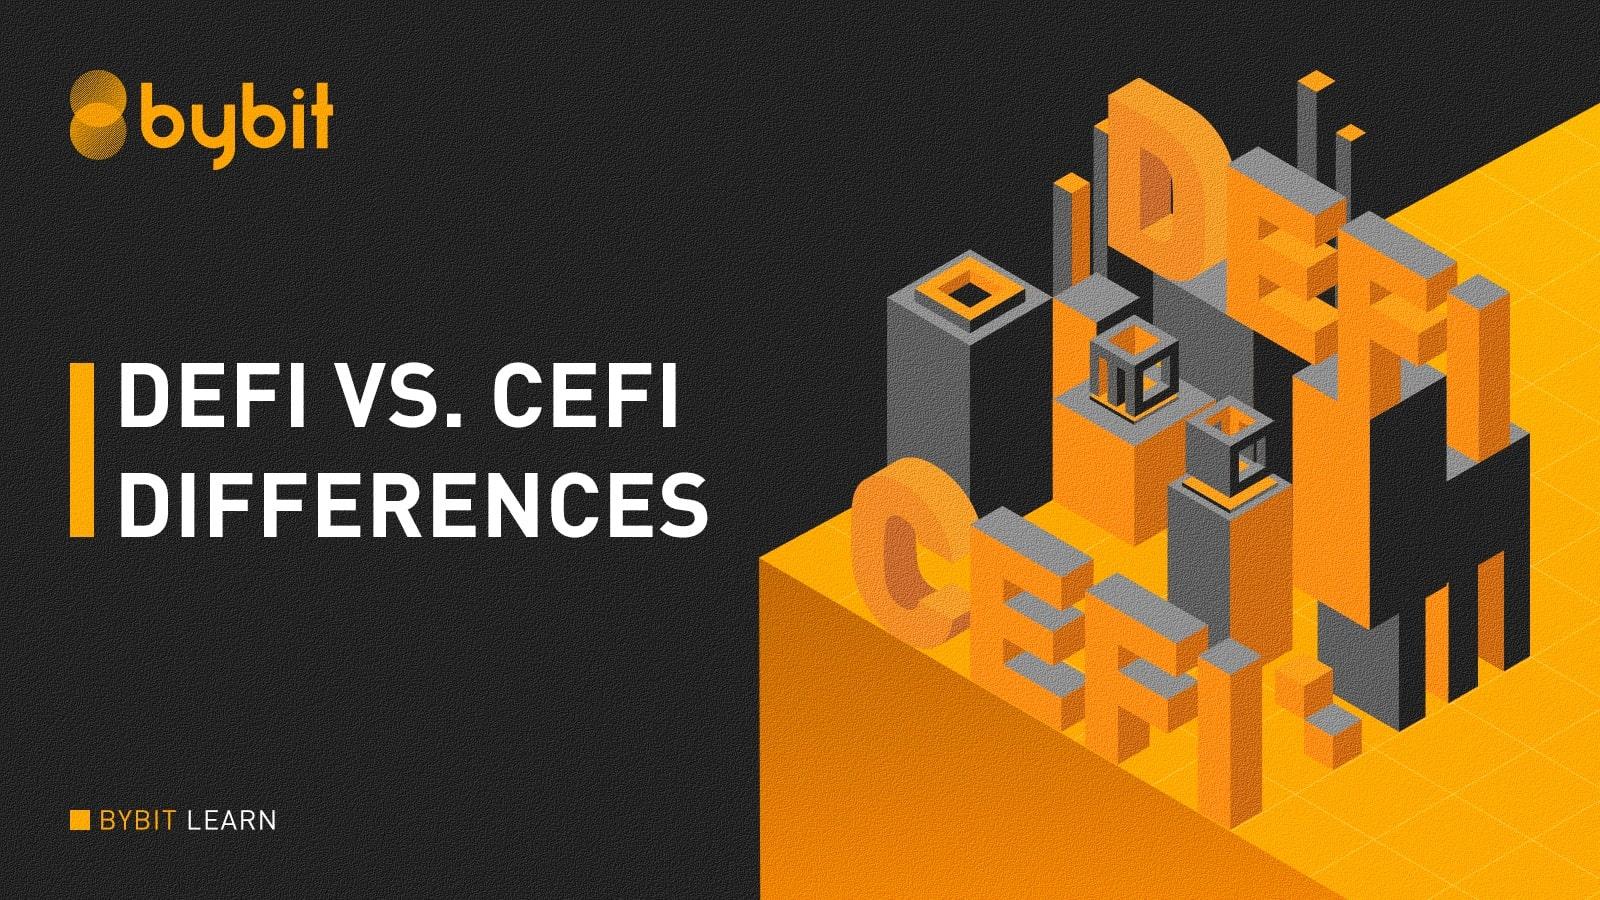 Defi vs CeFi Differences